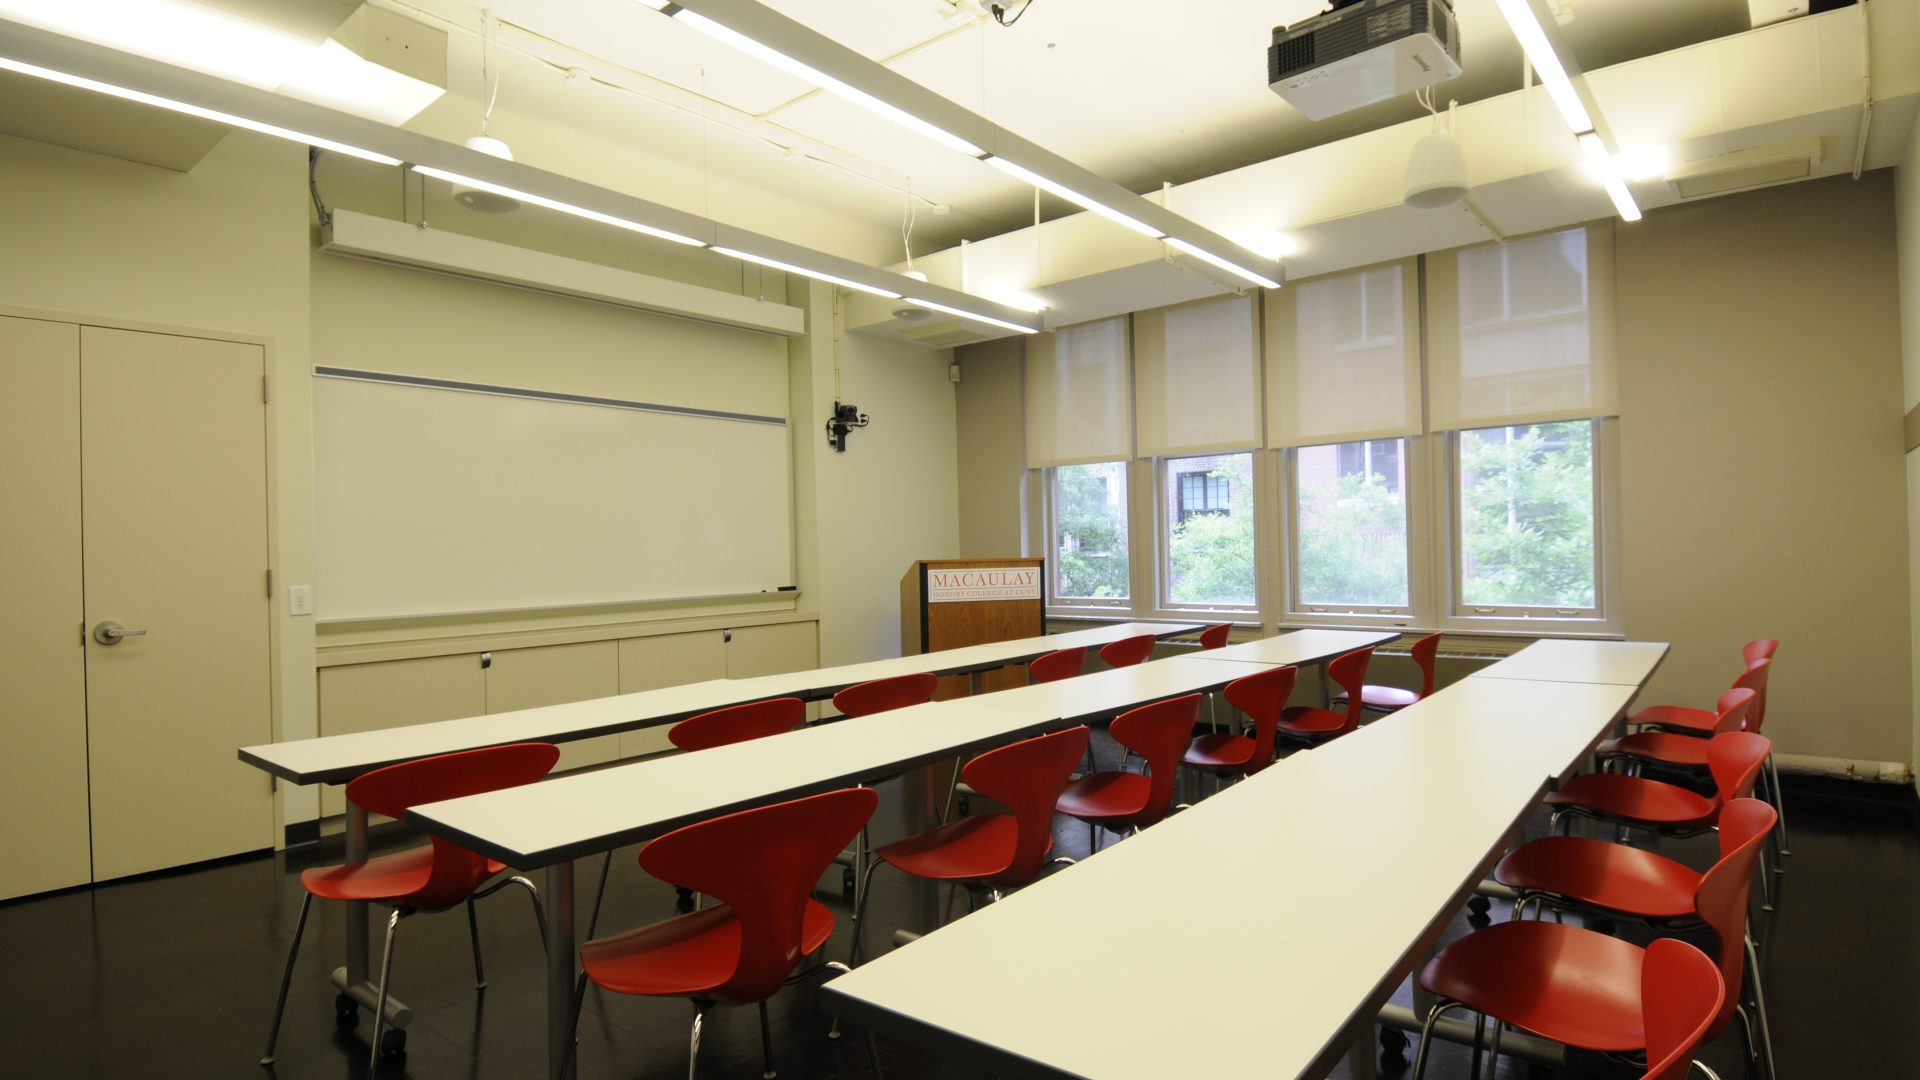 Photo of the Macaulay classrooms